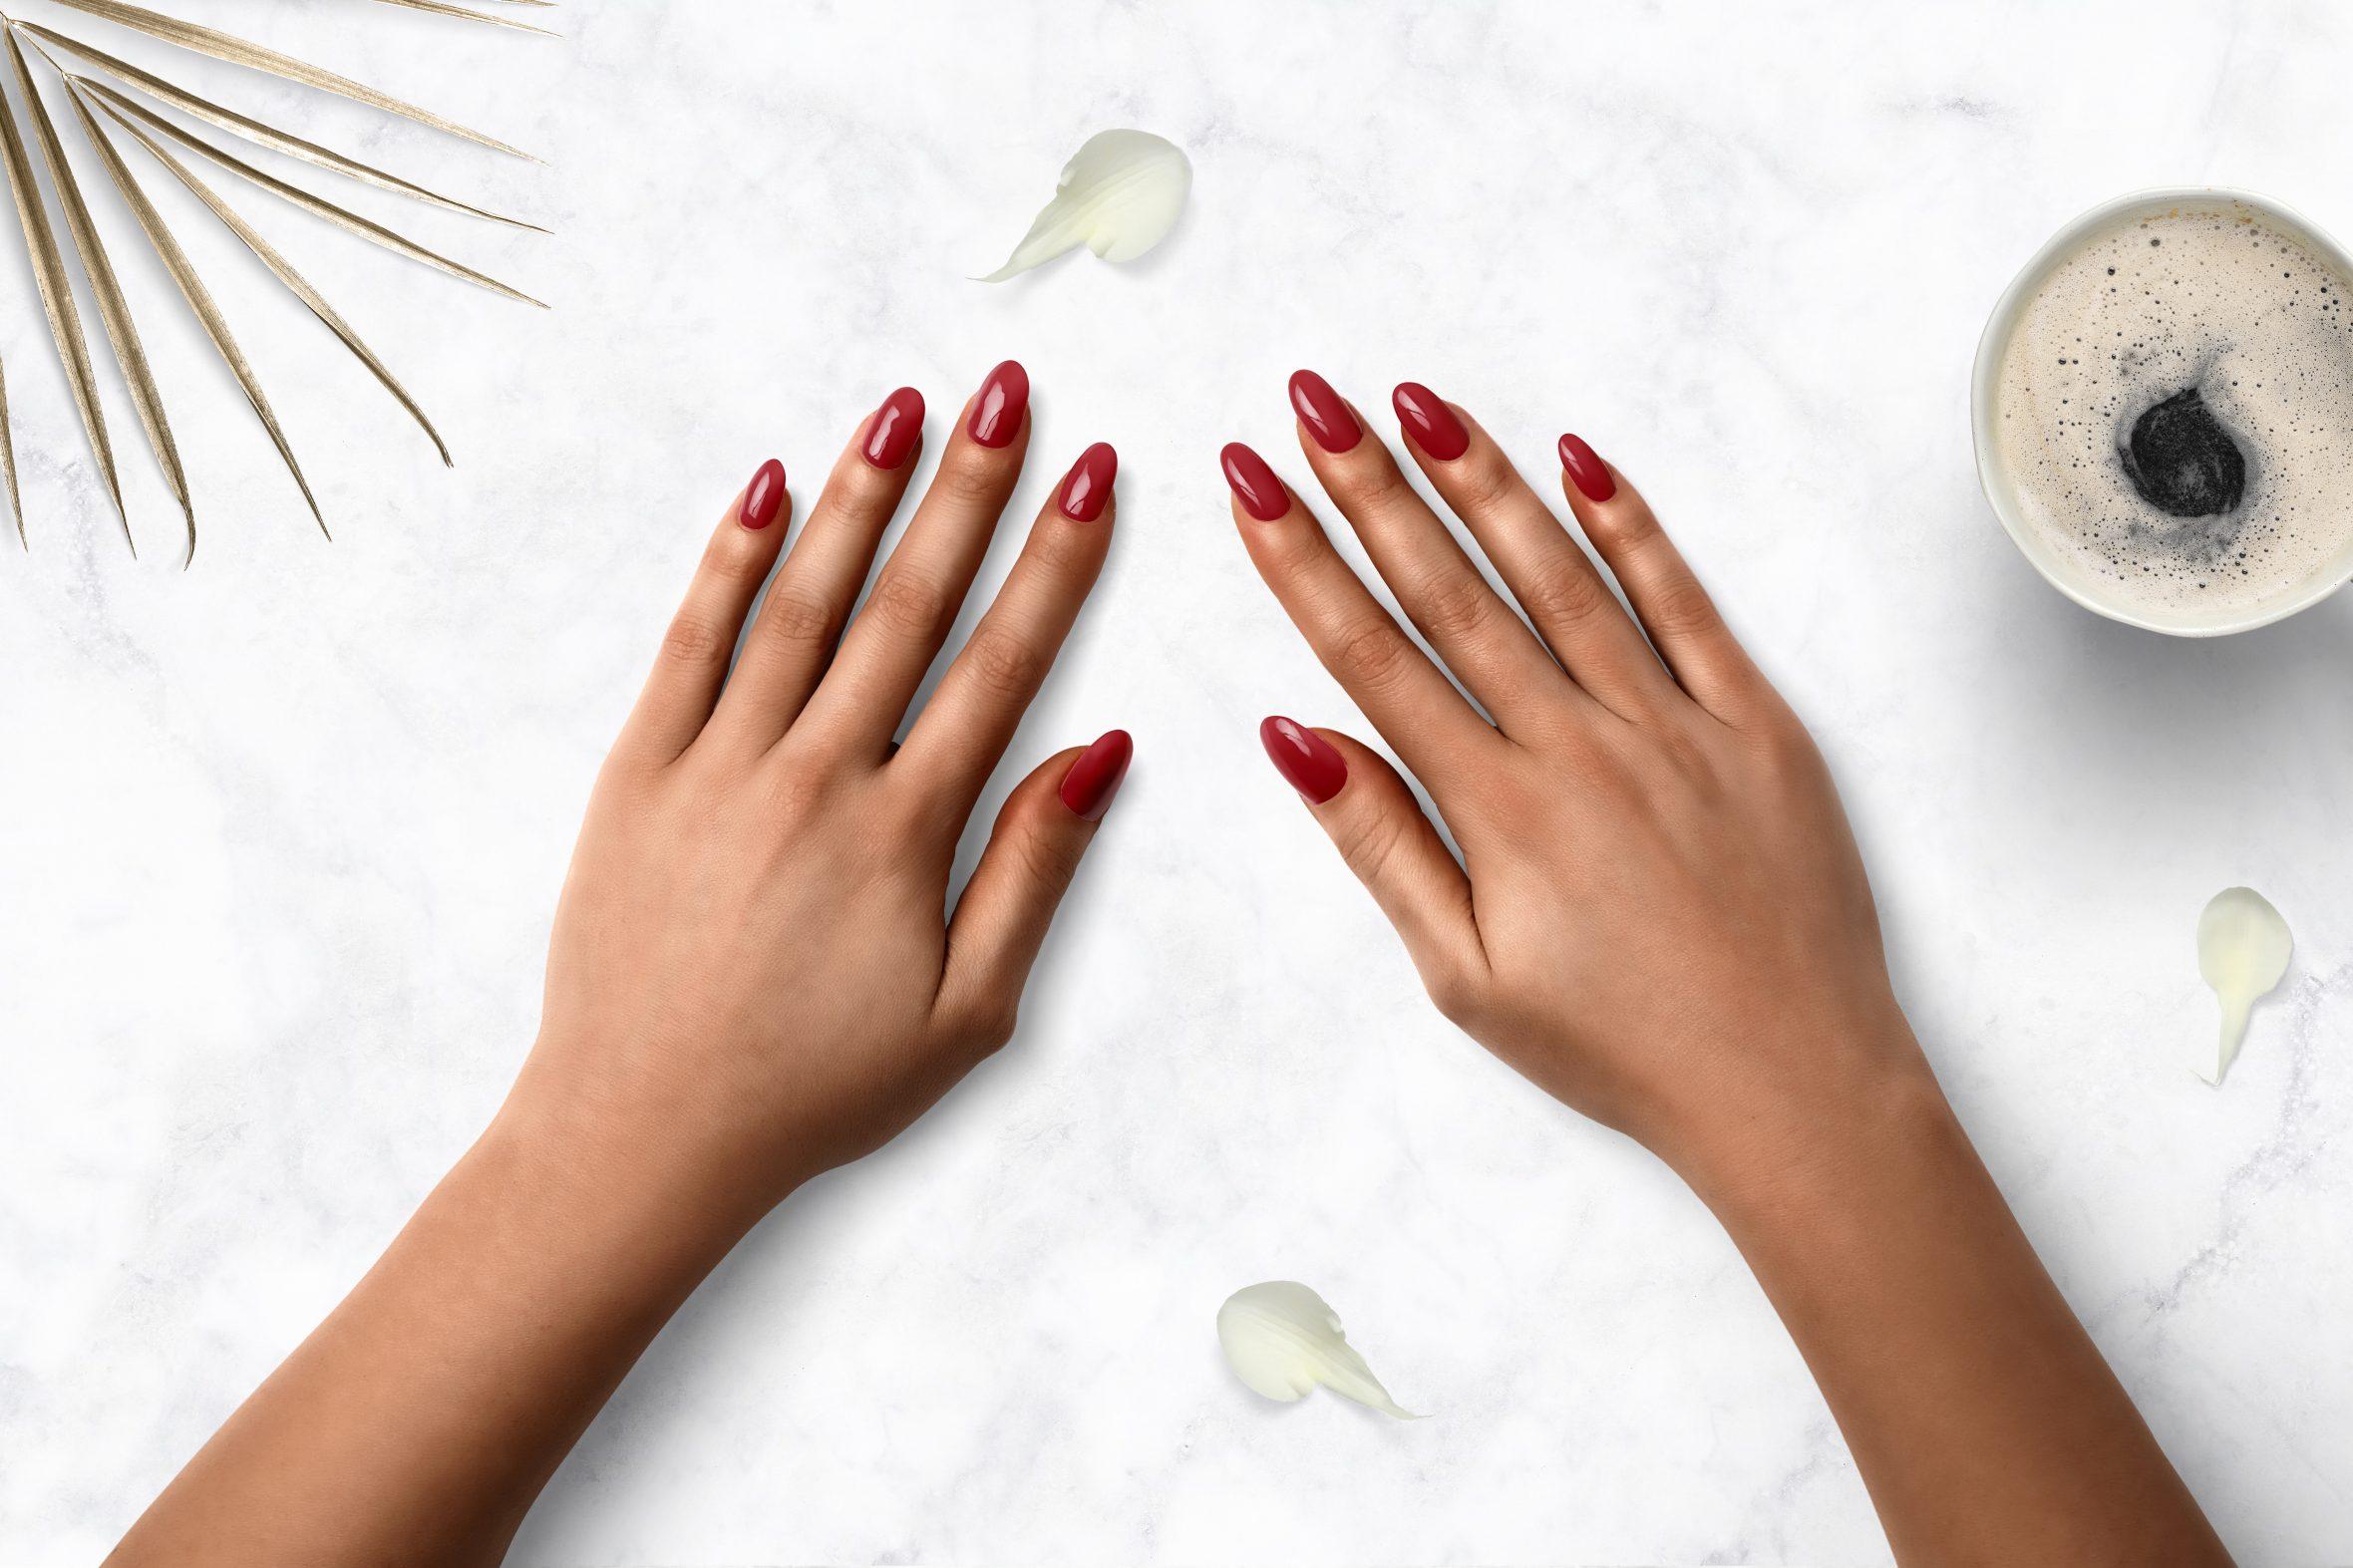 bordeaux rode nagellak op je nagels